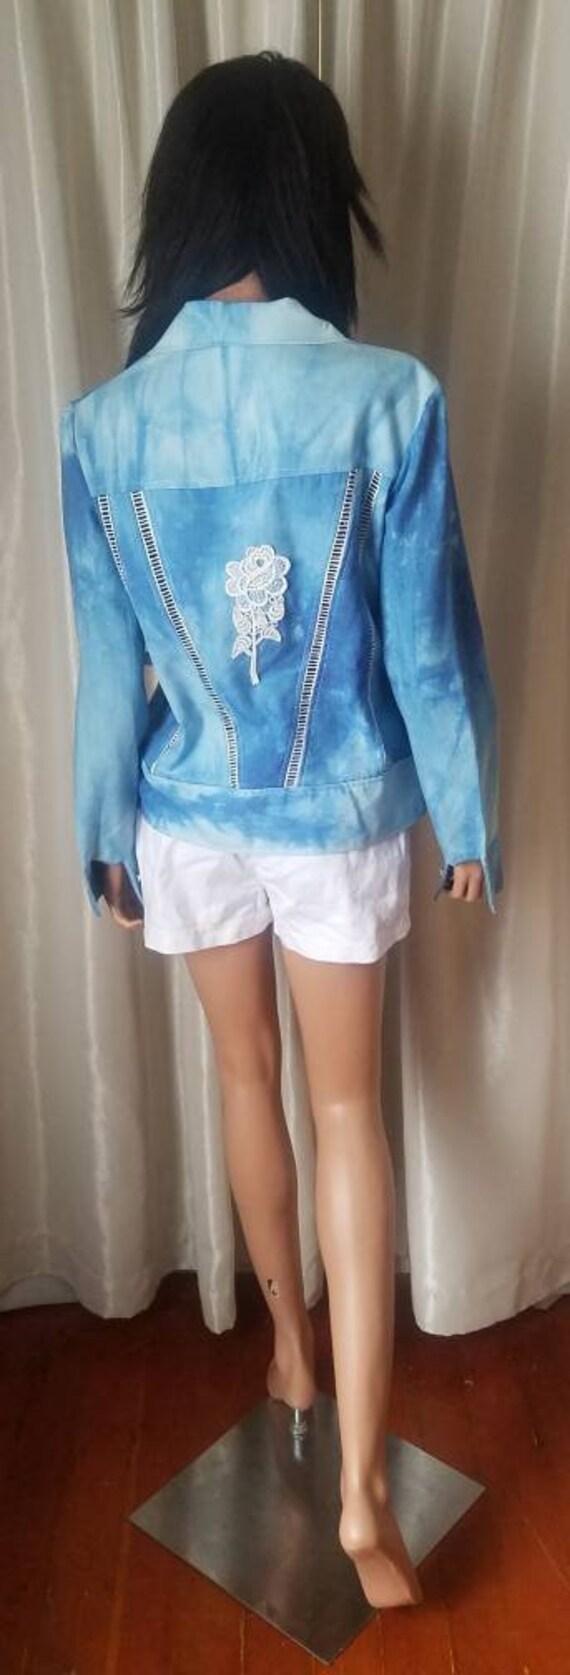 70s vintage nos s small medium m jeans jacket Ron… - image 4